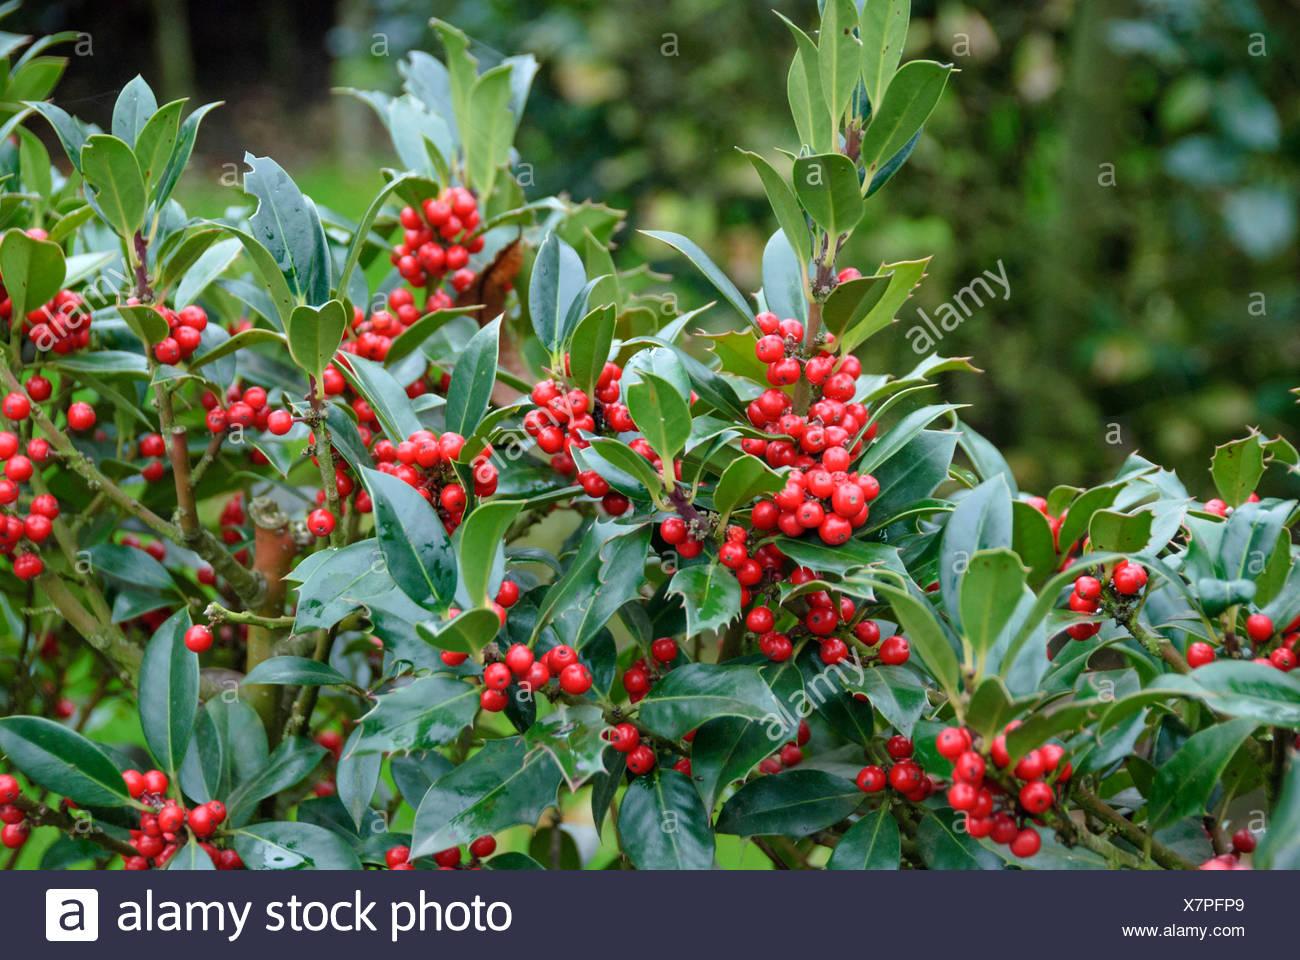 common holly, English holly (Ilex aquifolium 'JC van Tol', Ilex aquifolium JC van Tol), cultivar JC van Tol - Stock Image